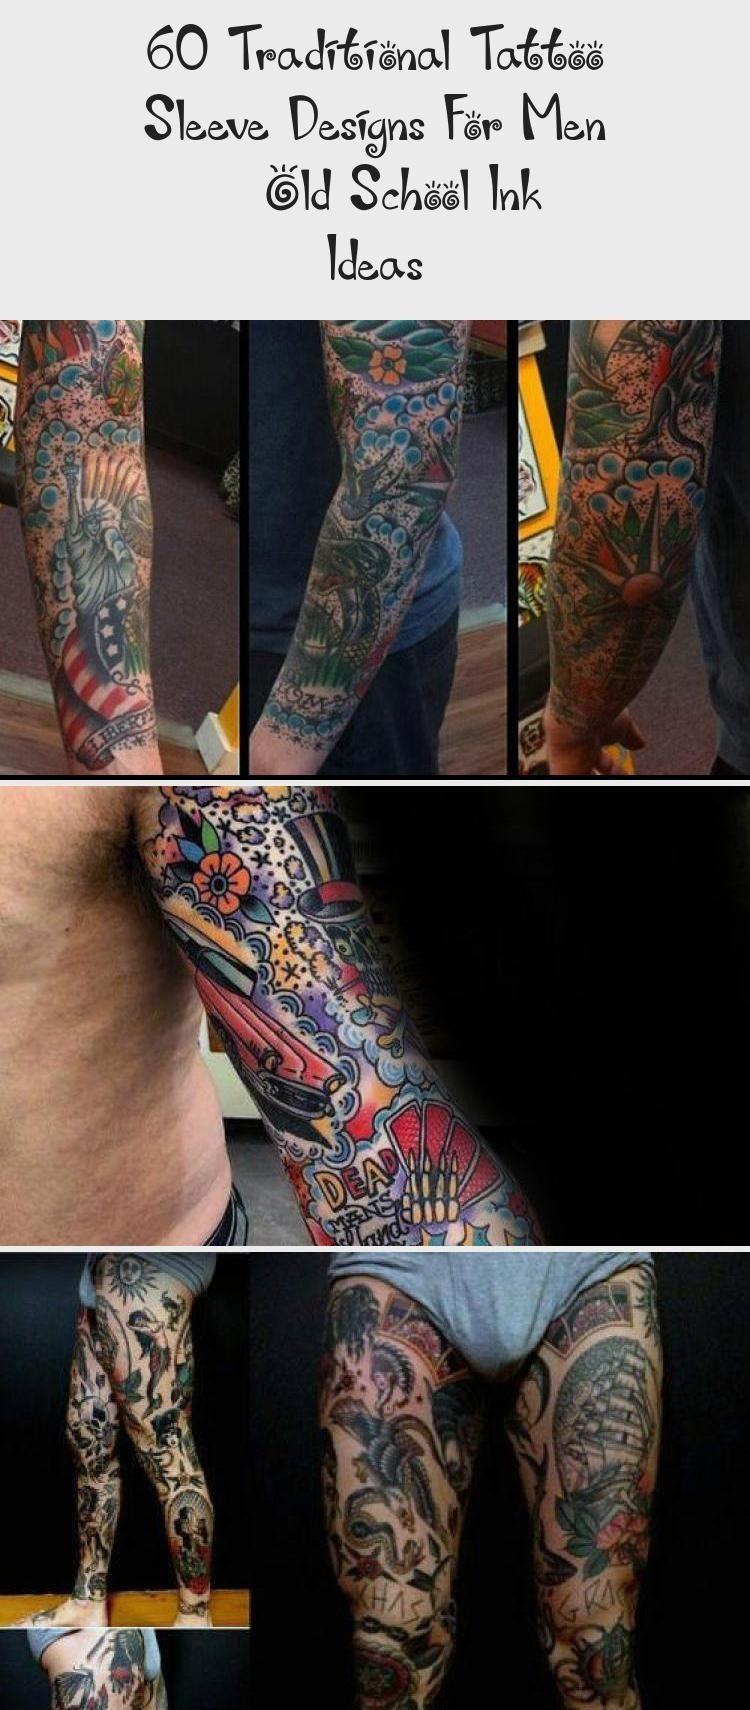 60 Traditional Tattoo Sleeve Designs For Men – Old School Ink Ideas - Tattoo - Mens Black